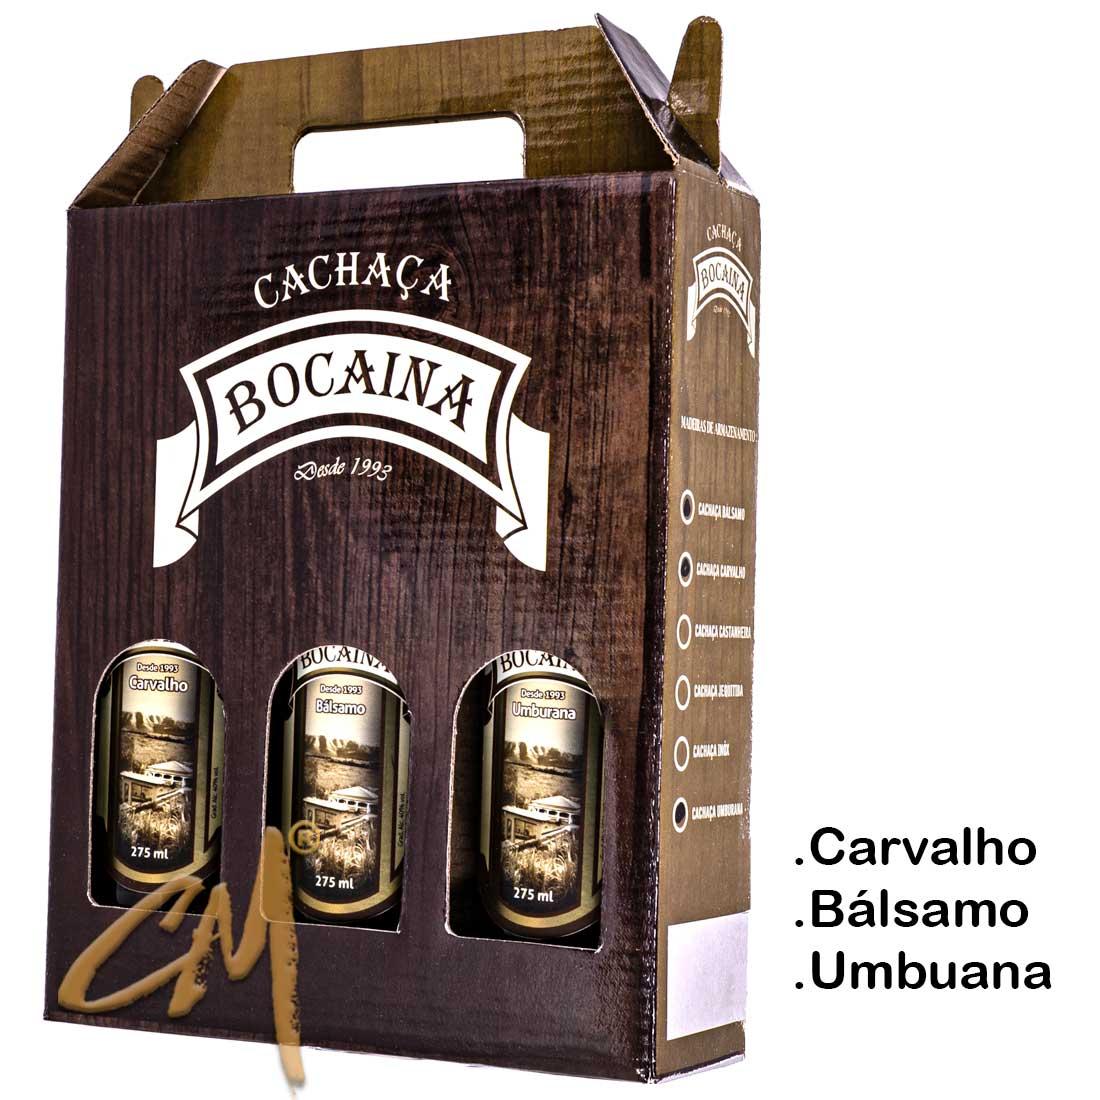 Cachaça Bocaina 275 ml - Kit Carvalho-Bálsamo-Umburana  (Lavras - MG)